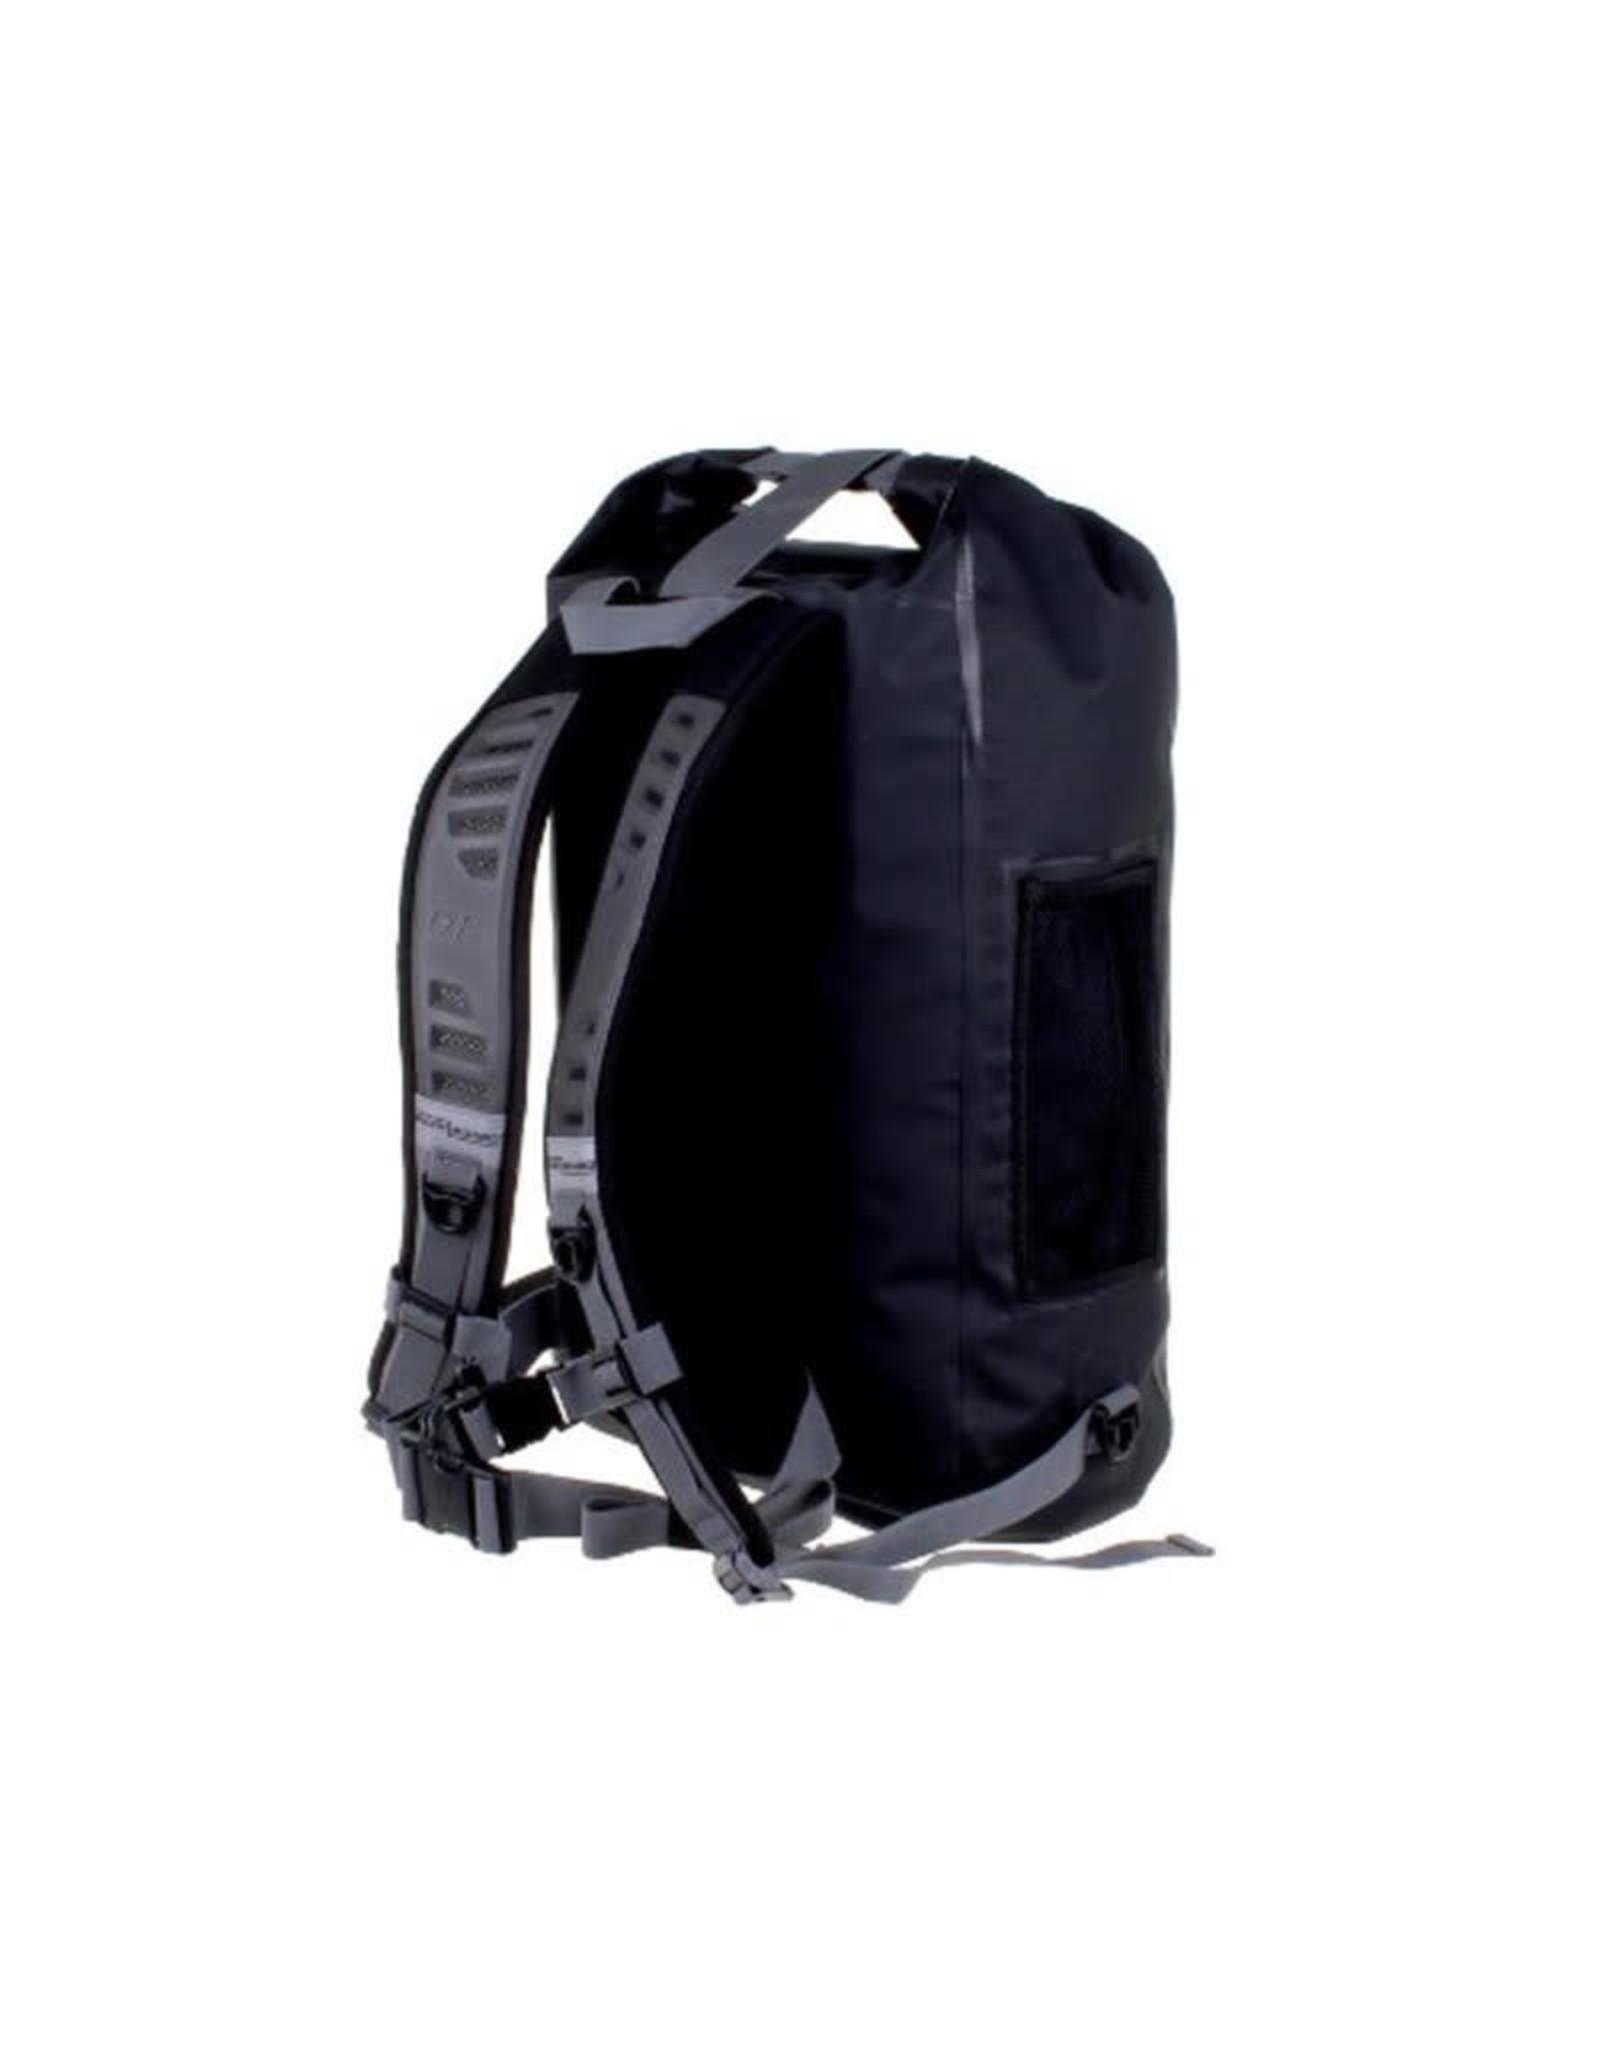 OverBoard OverBoard waterproof Backpack Pro-Vis 30 Liter Black